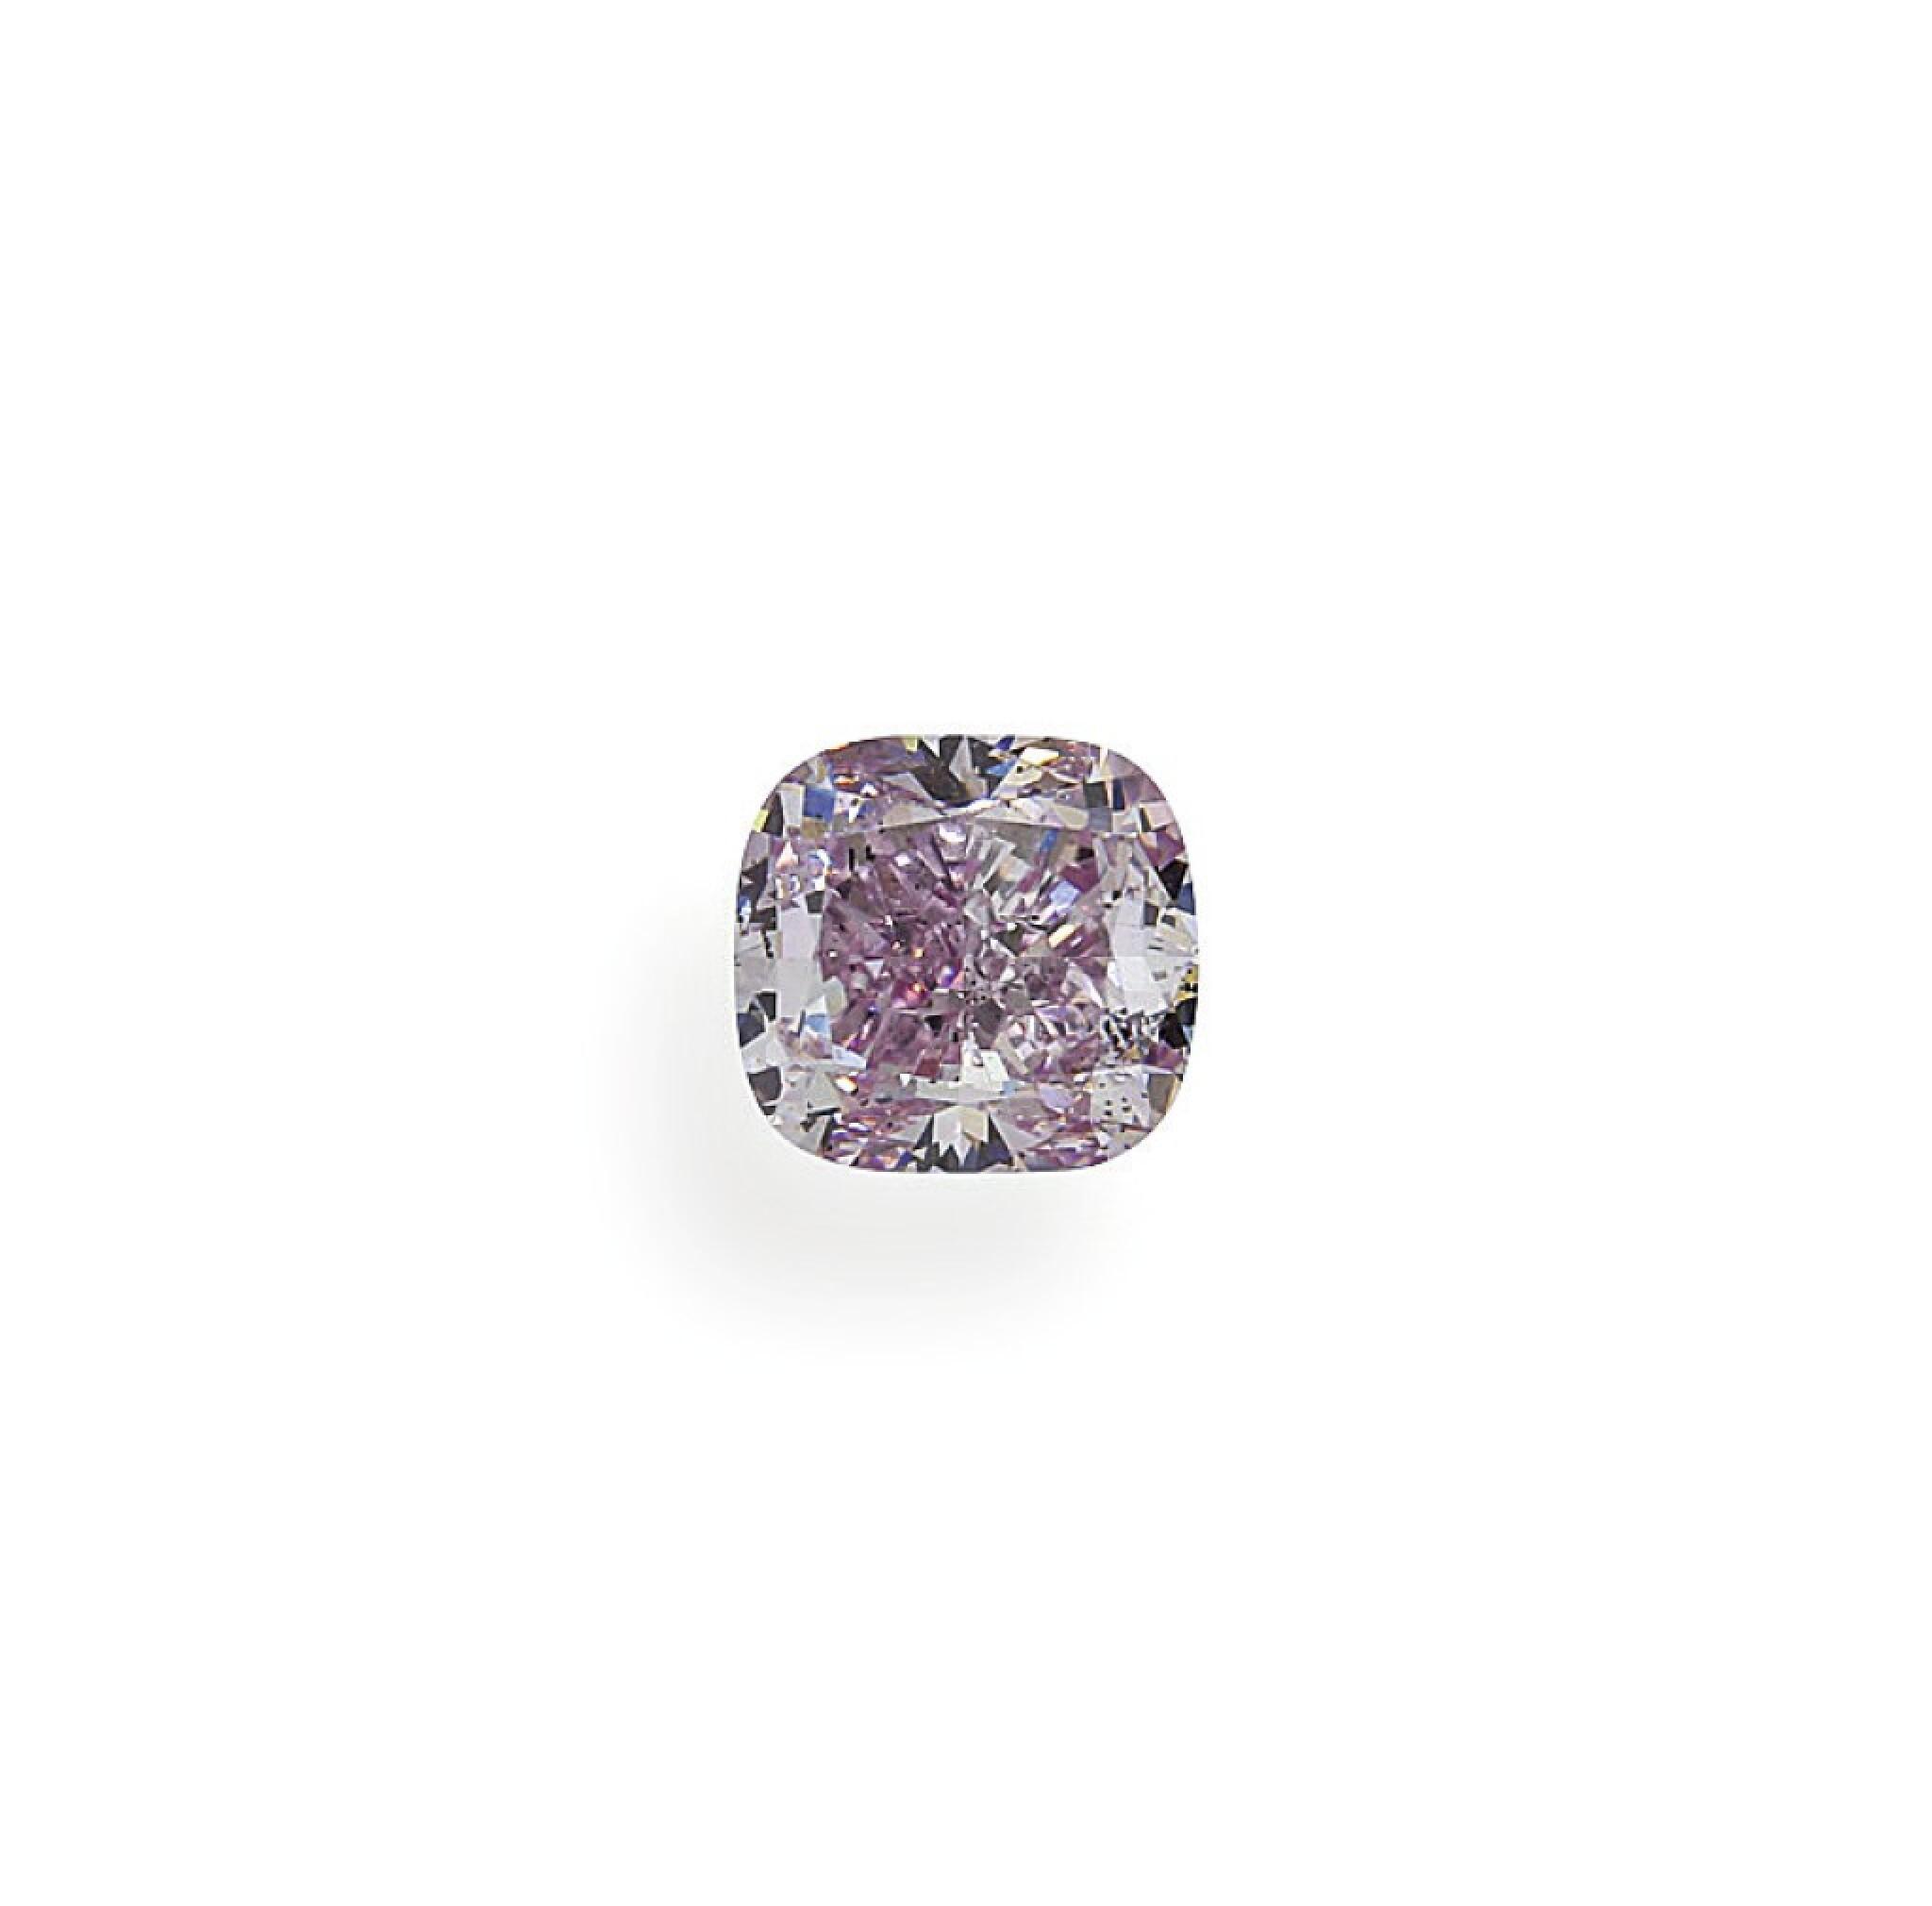 View full screen - View 1 of Lot 27. A 1.01 Carat Fancy Pink-Purple Cushion-Cut Diamond, SI1 Clarity.